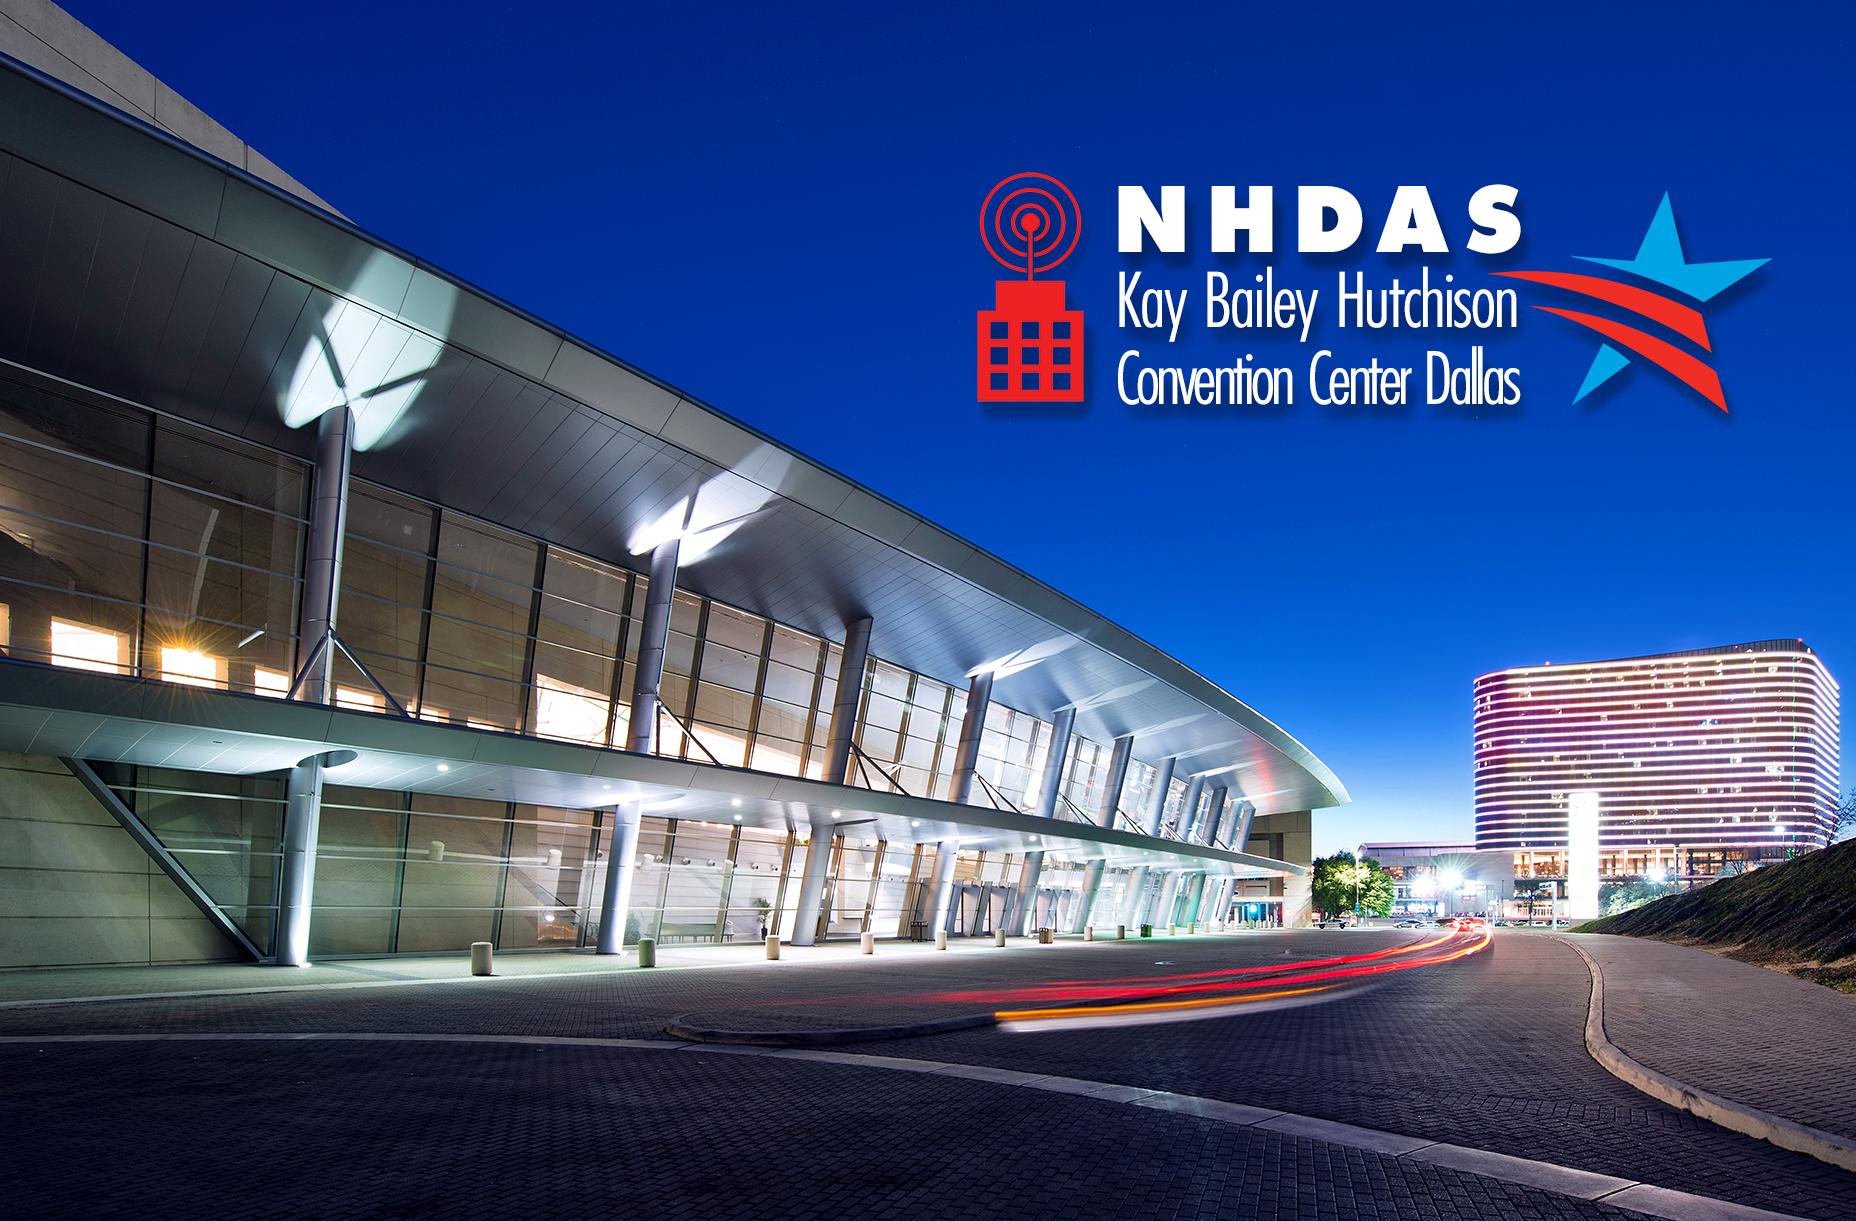 NHDAS at the KBHCCD